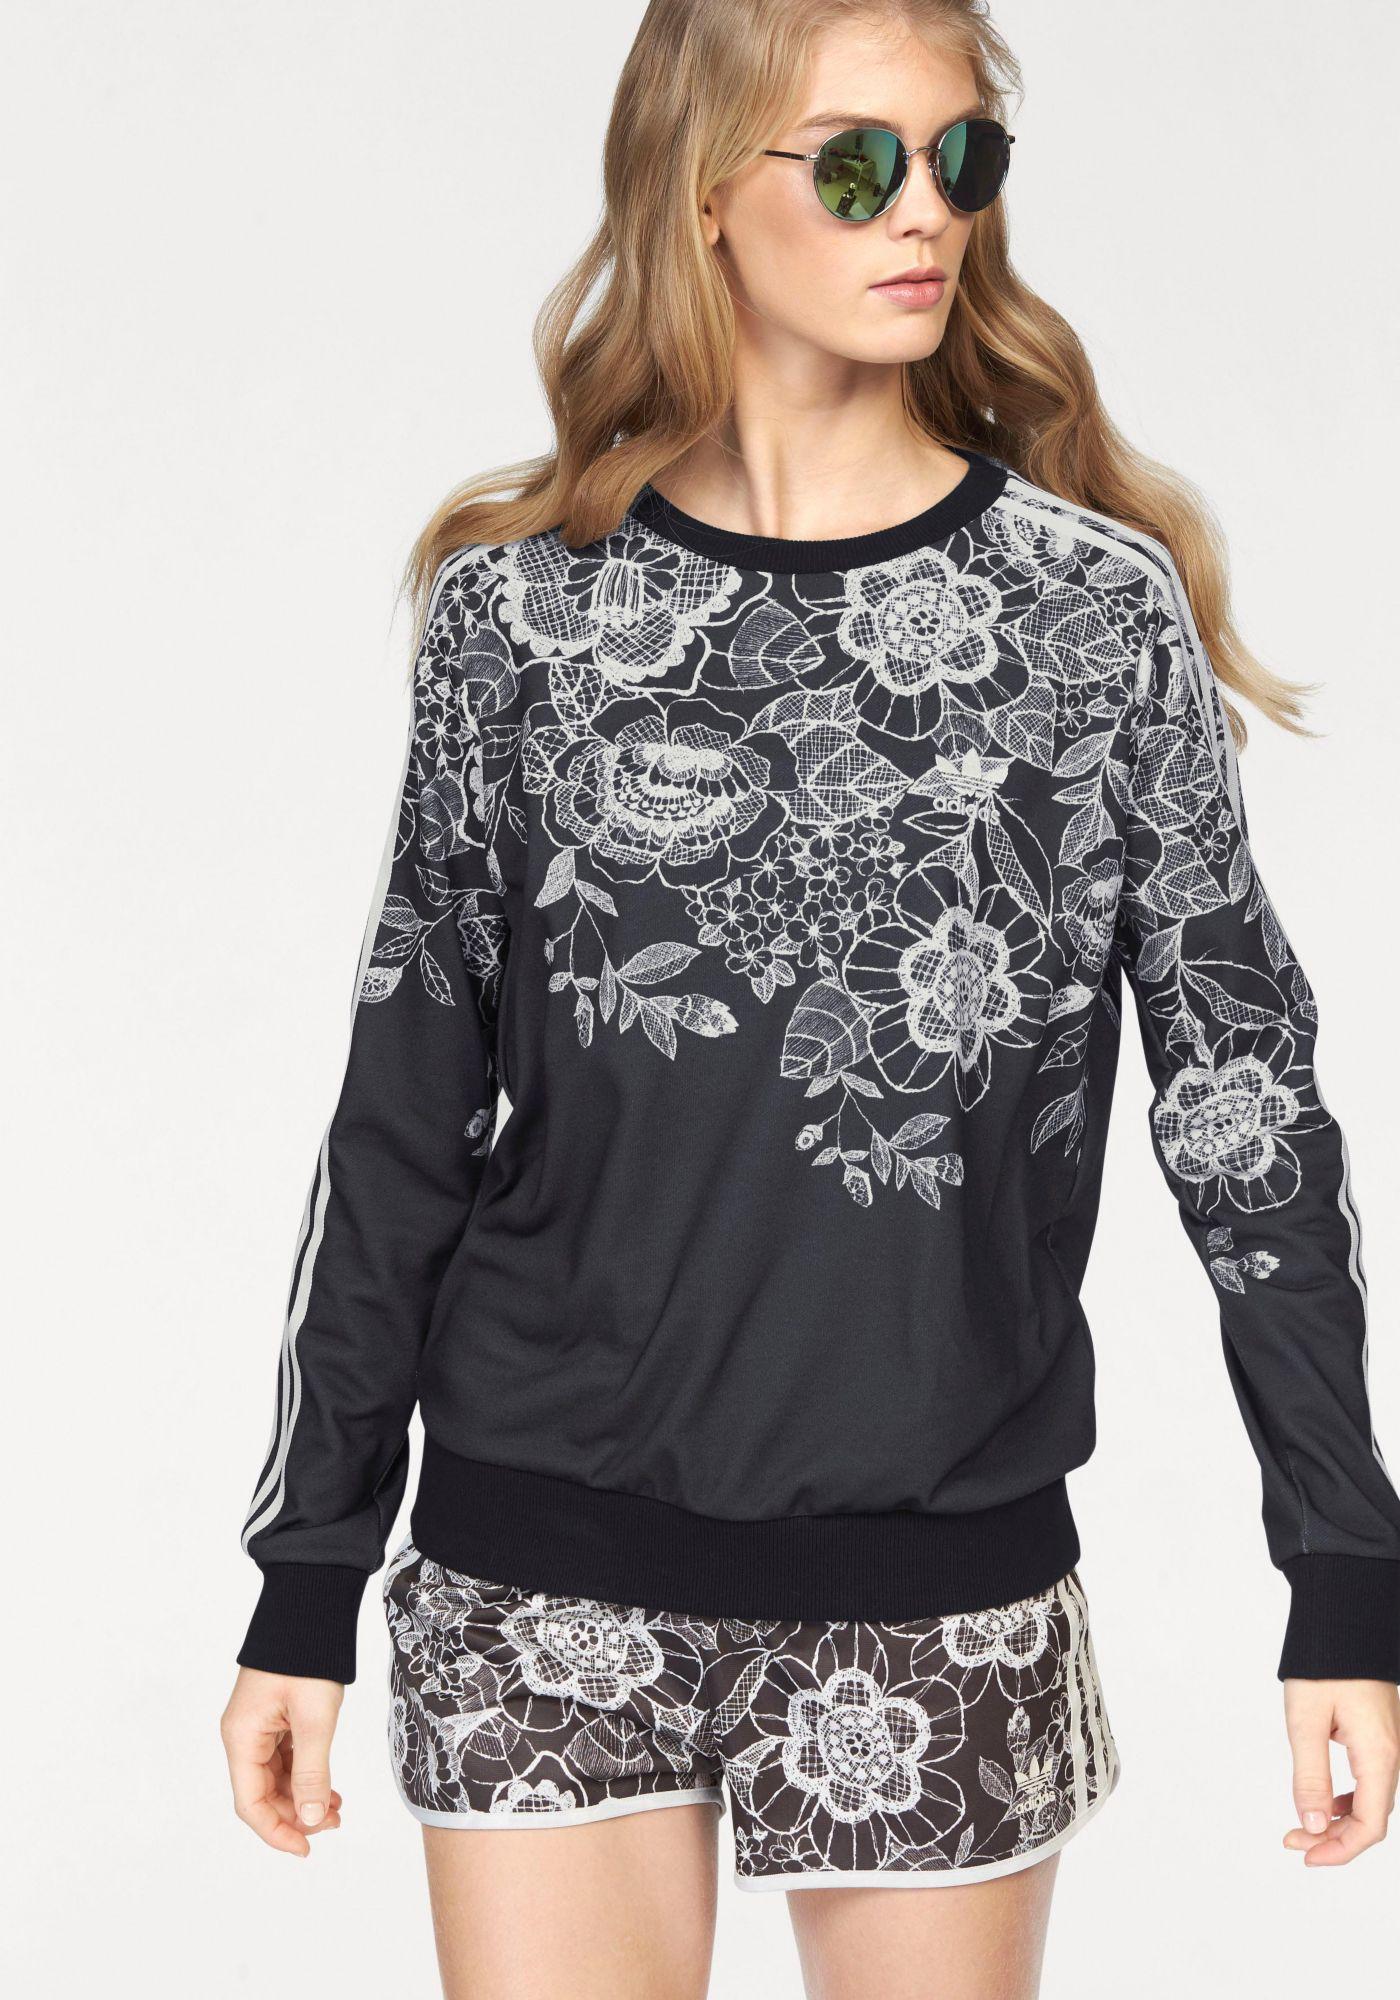 ADIDAS ORIGINALS adidas Originals Sweatshirt »Florido Crew Sweater«